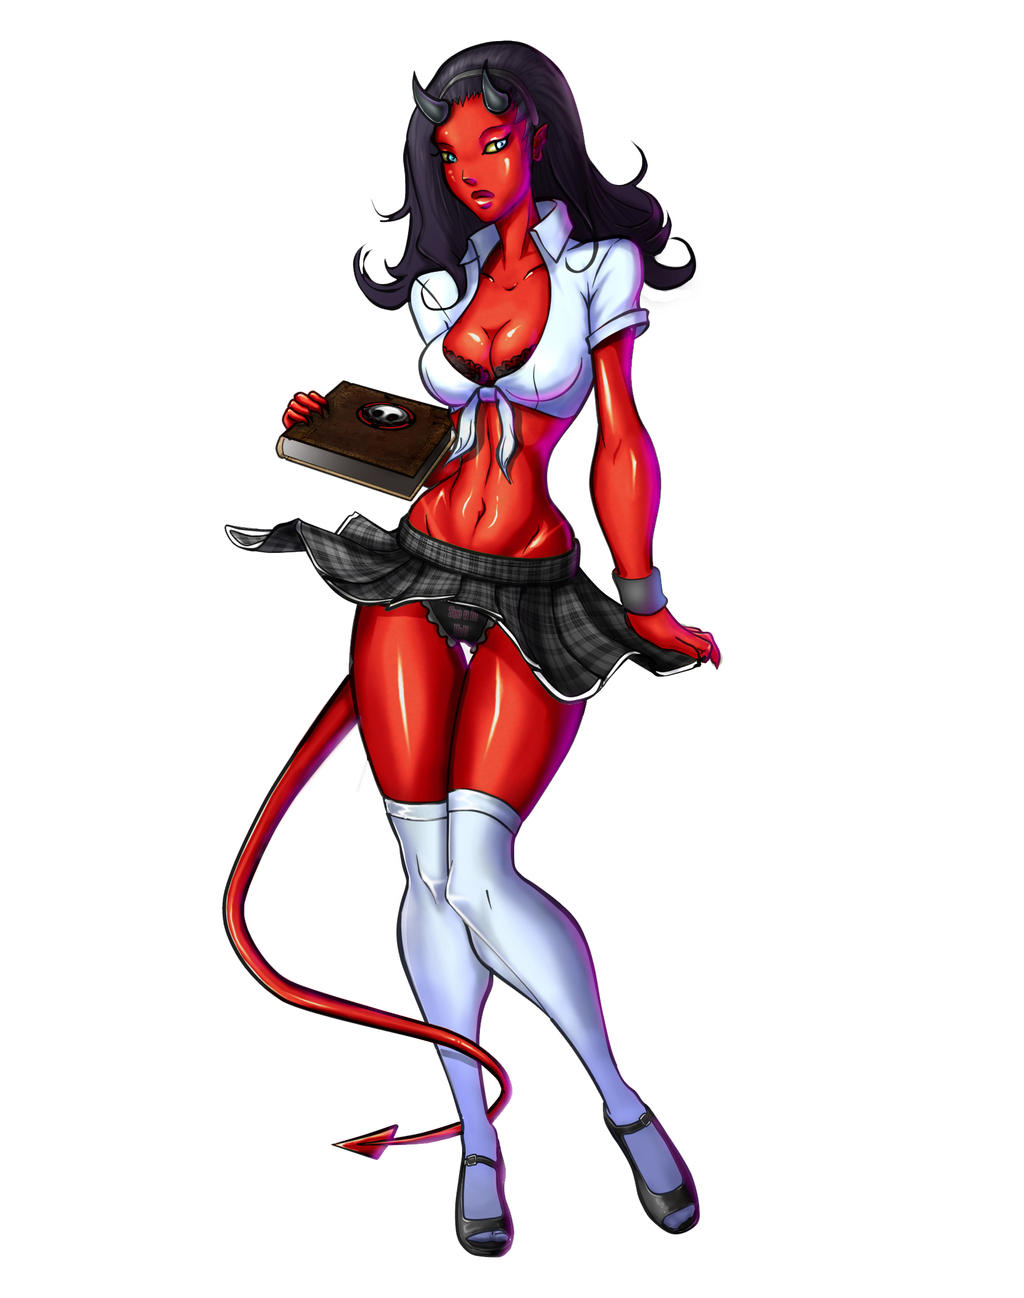 Demon school girl pinup by bogusbadge on deviantart - Hot demon women ...